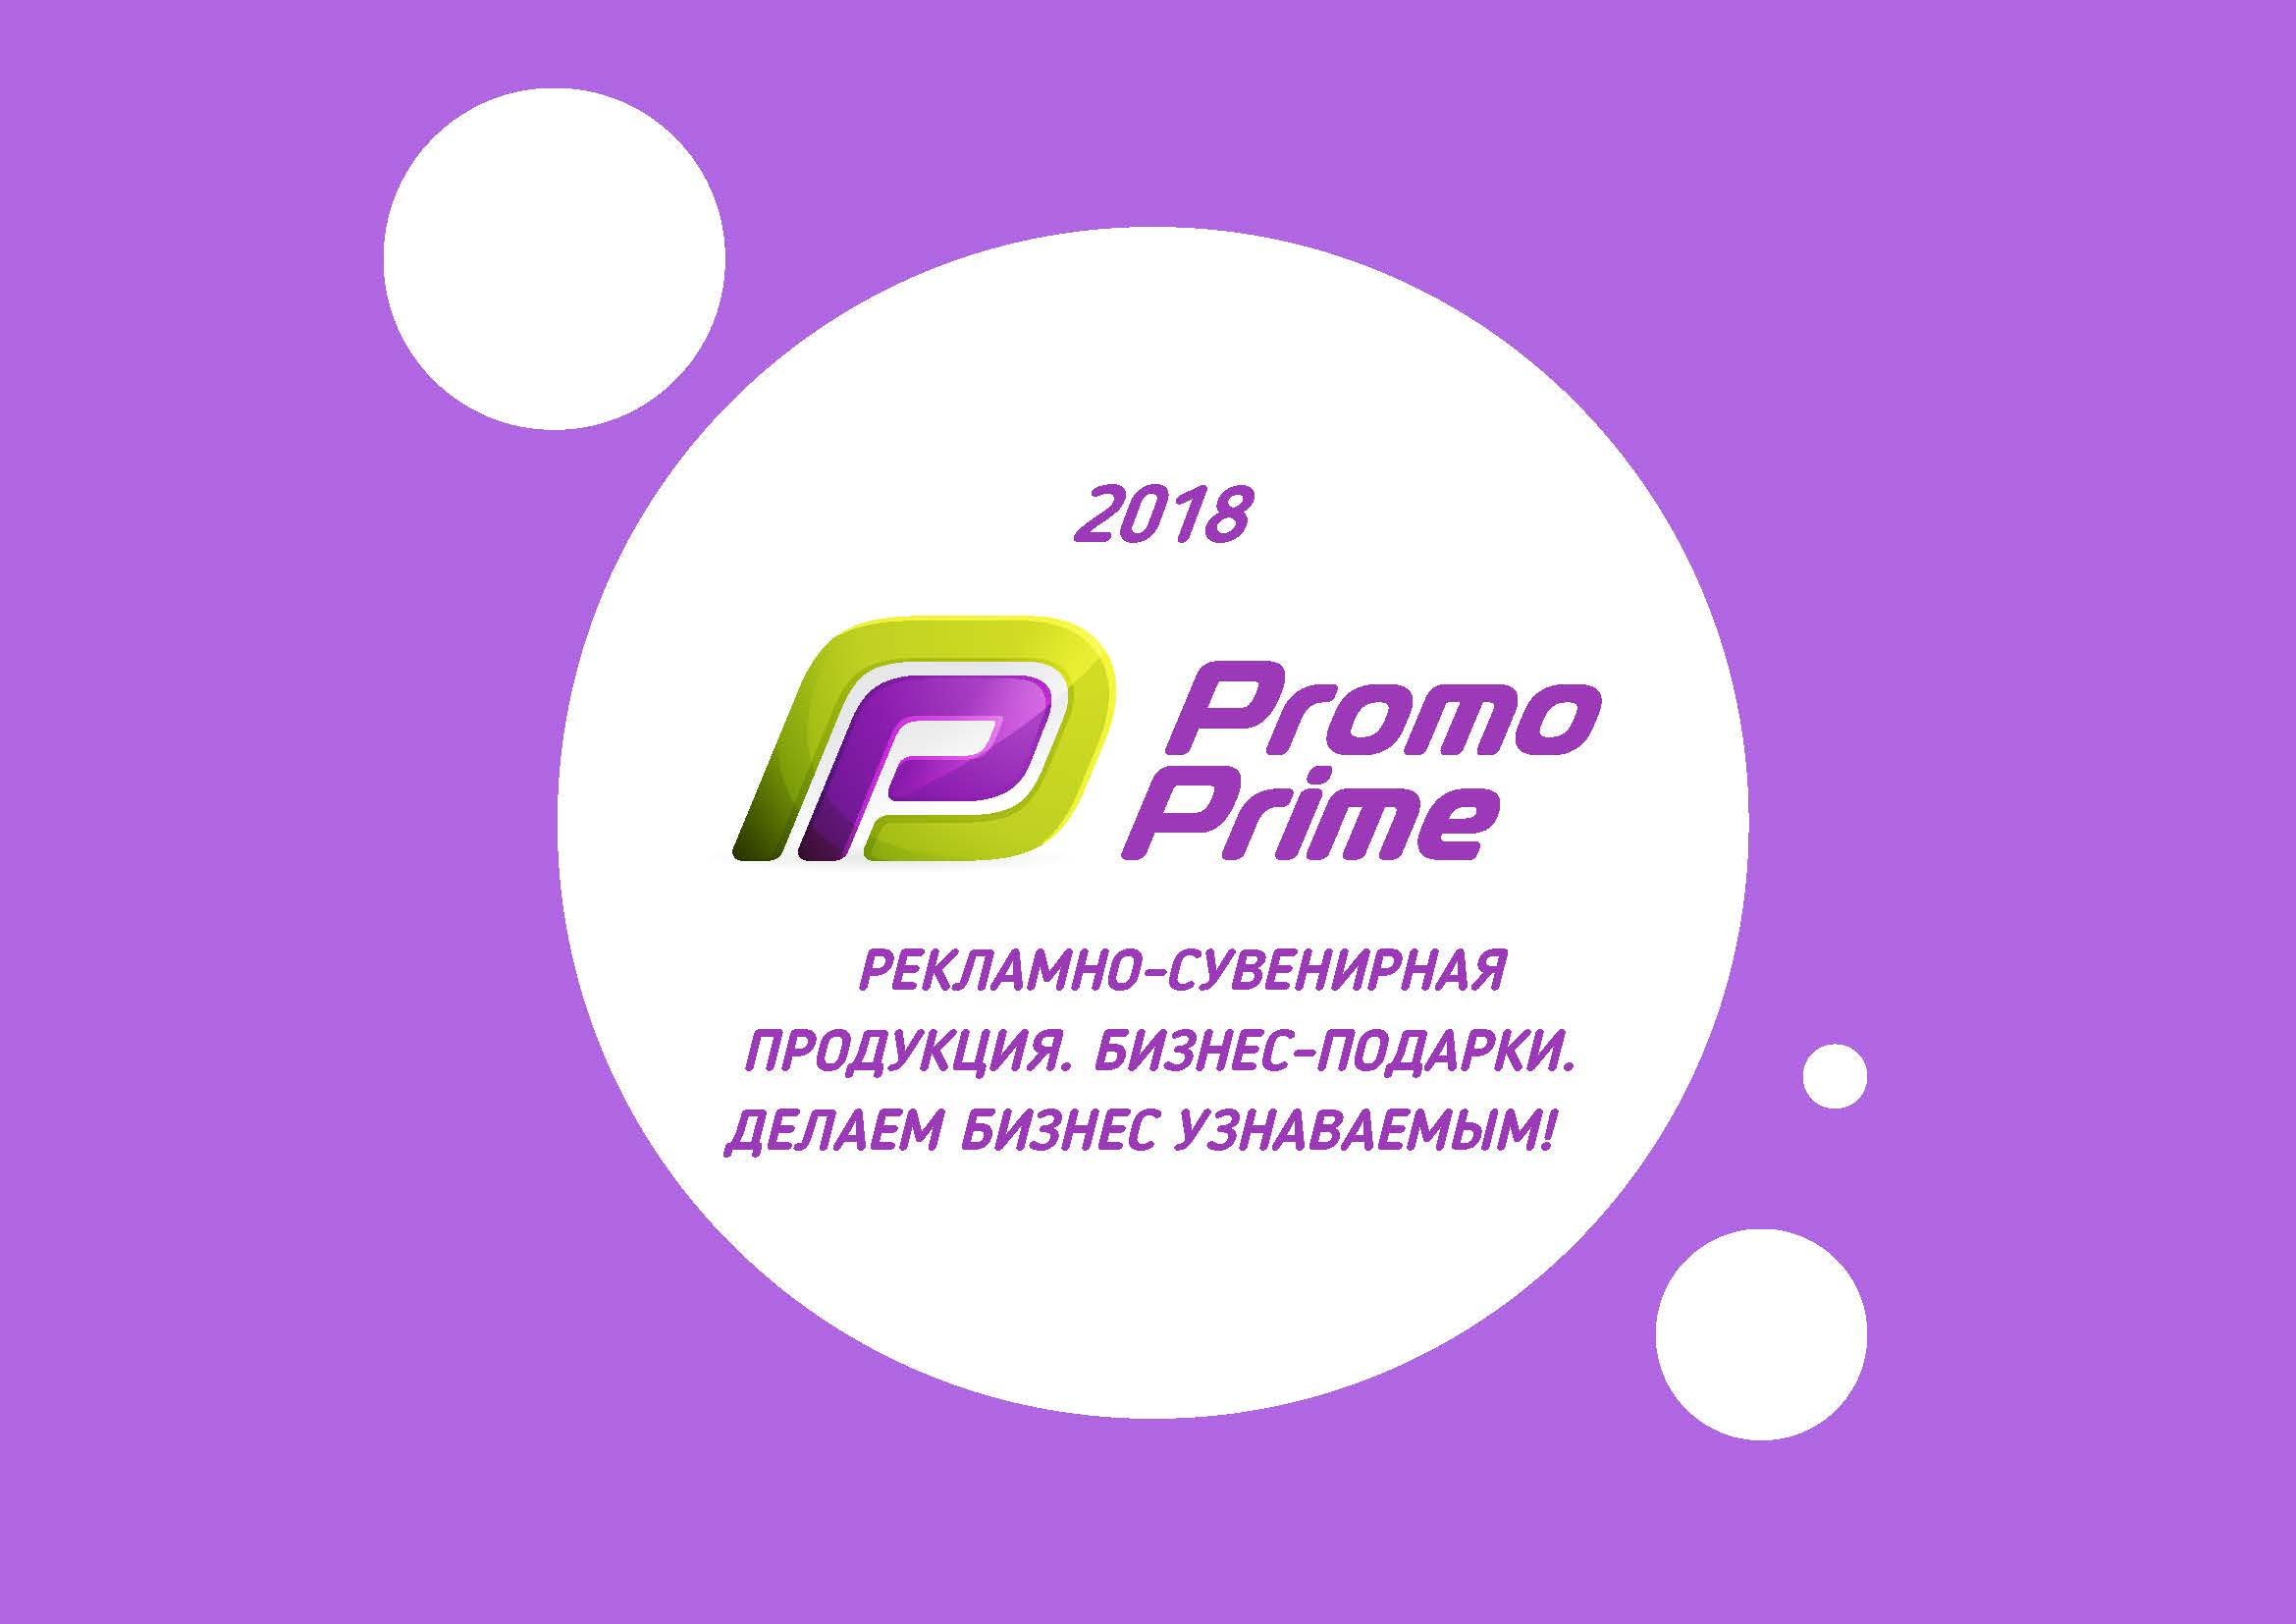 PromoPrime_info-kit_общий_Страница_01